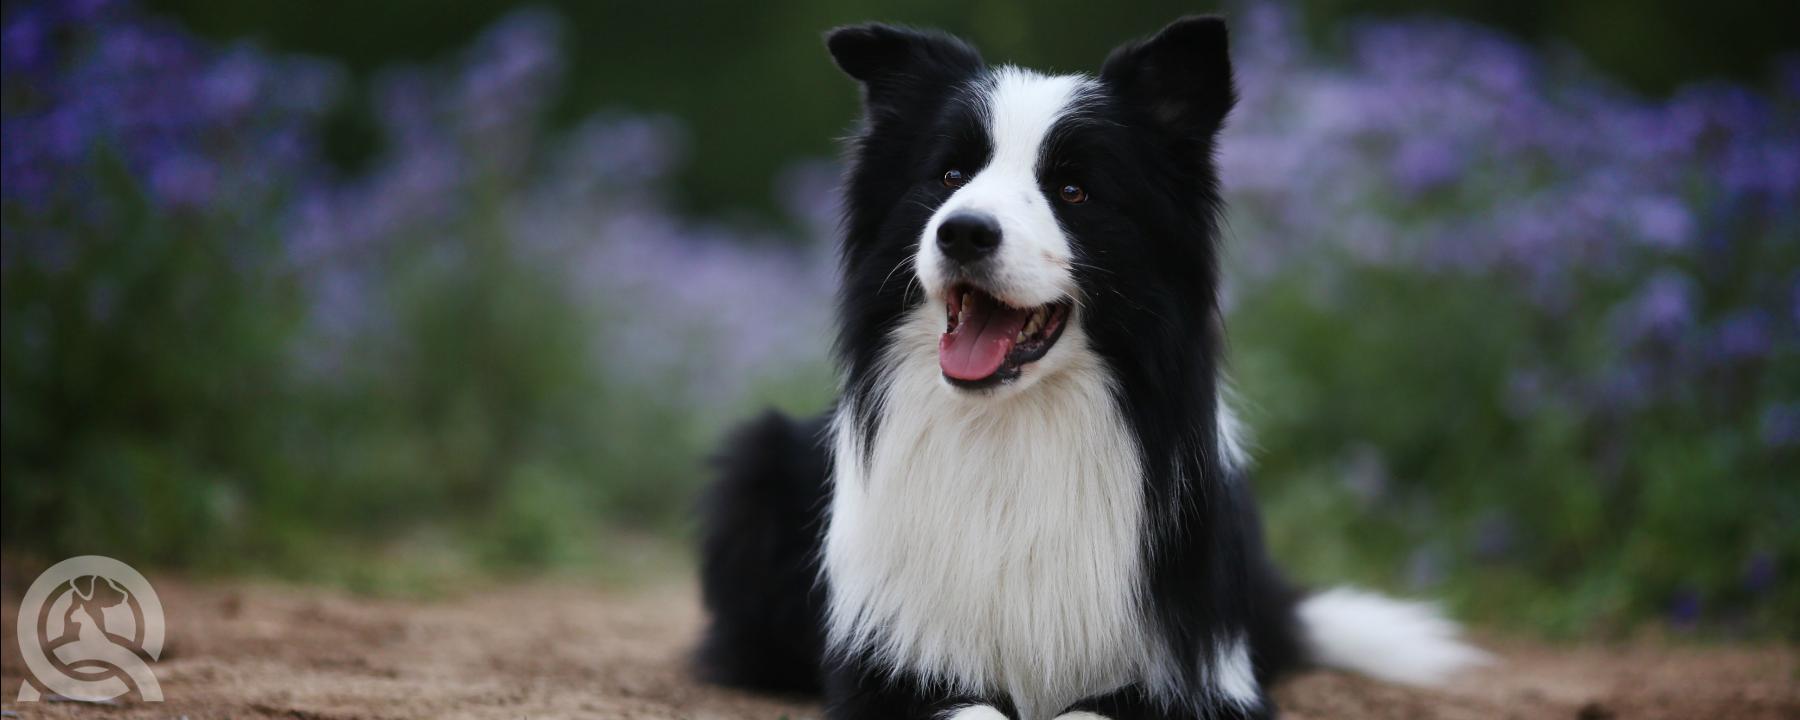 Dog Grooming vs. Animal Grooming Course